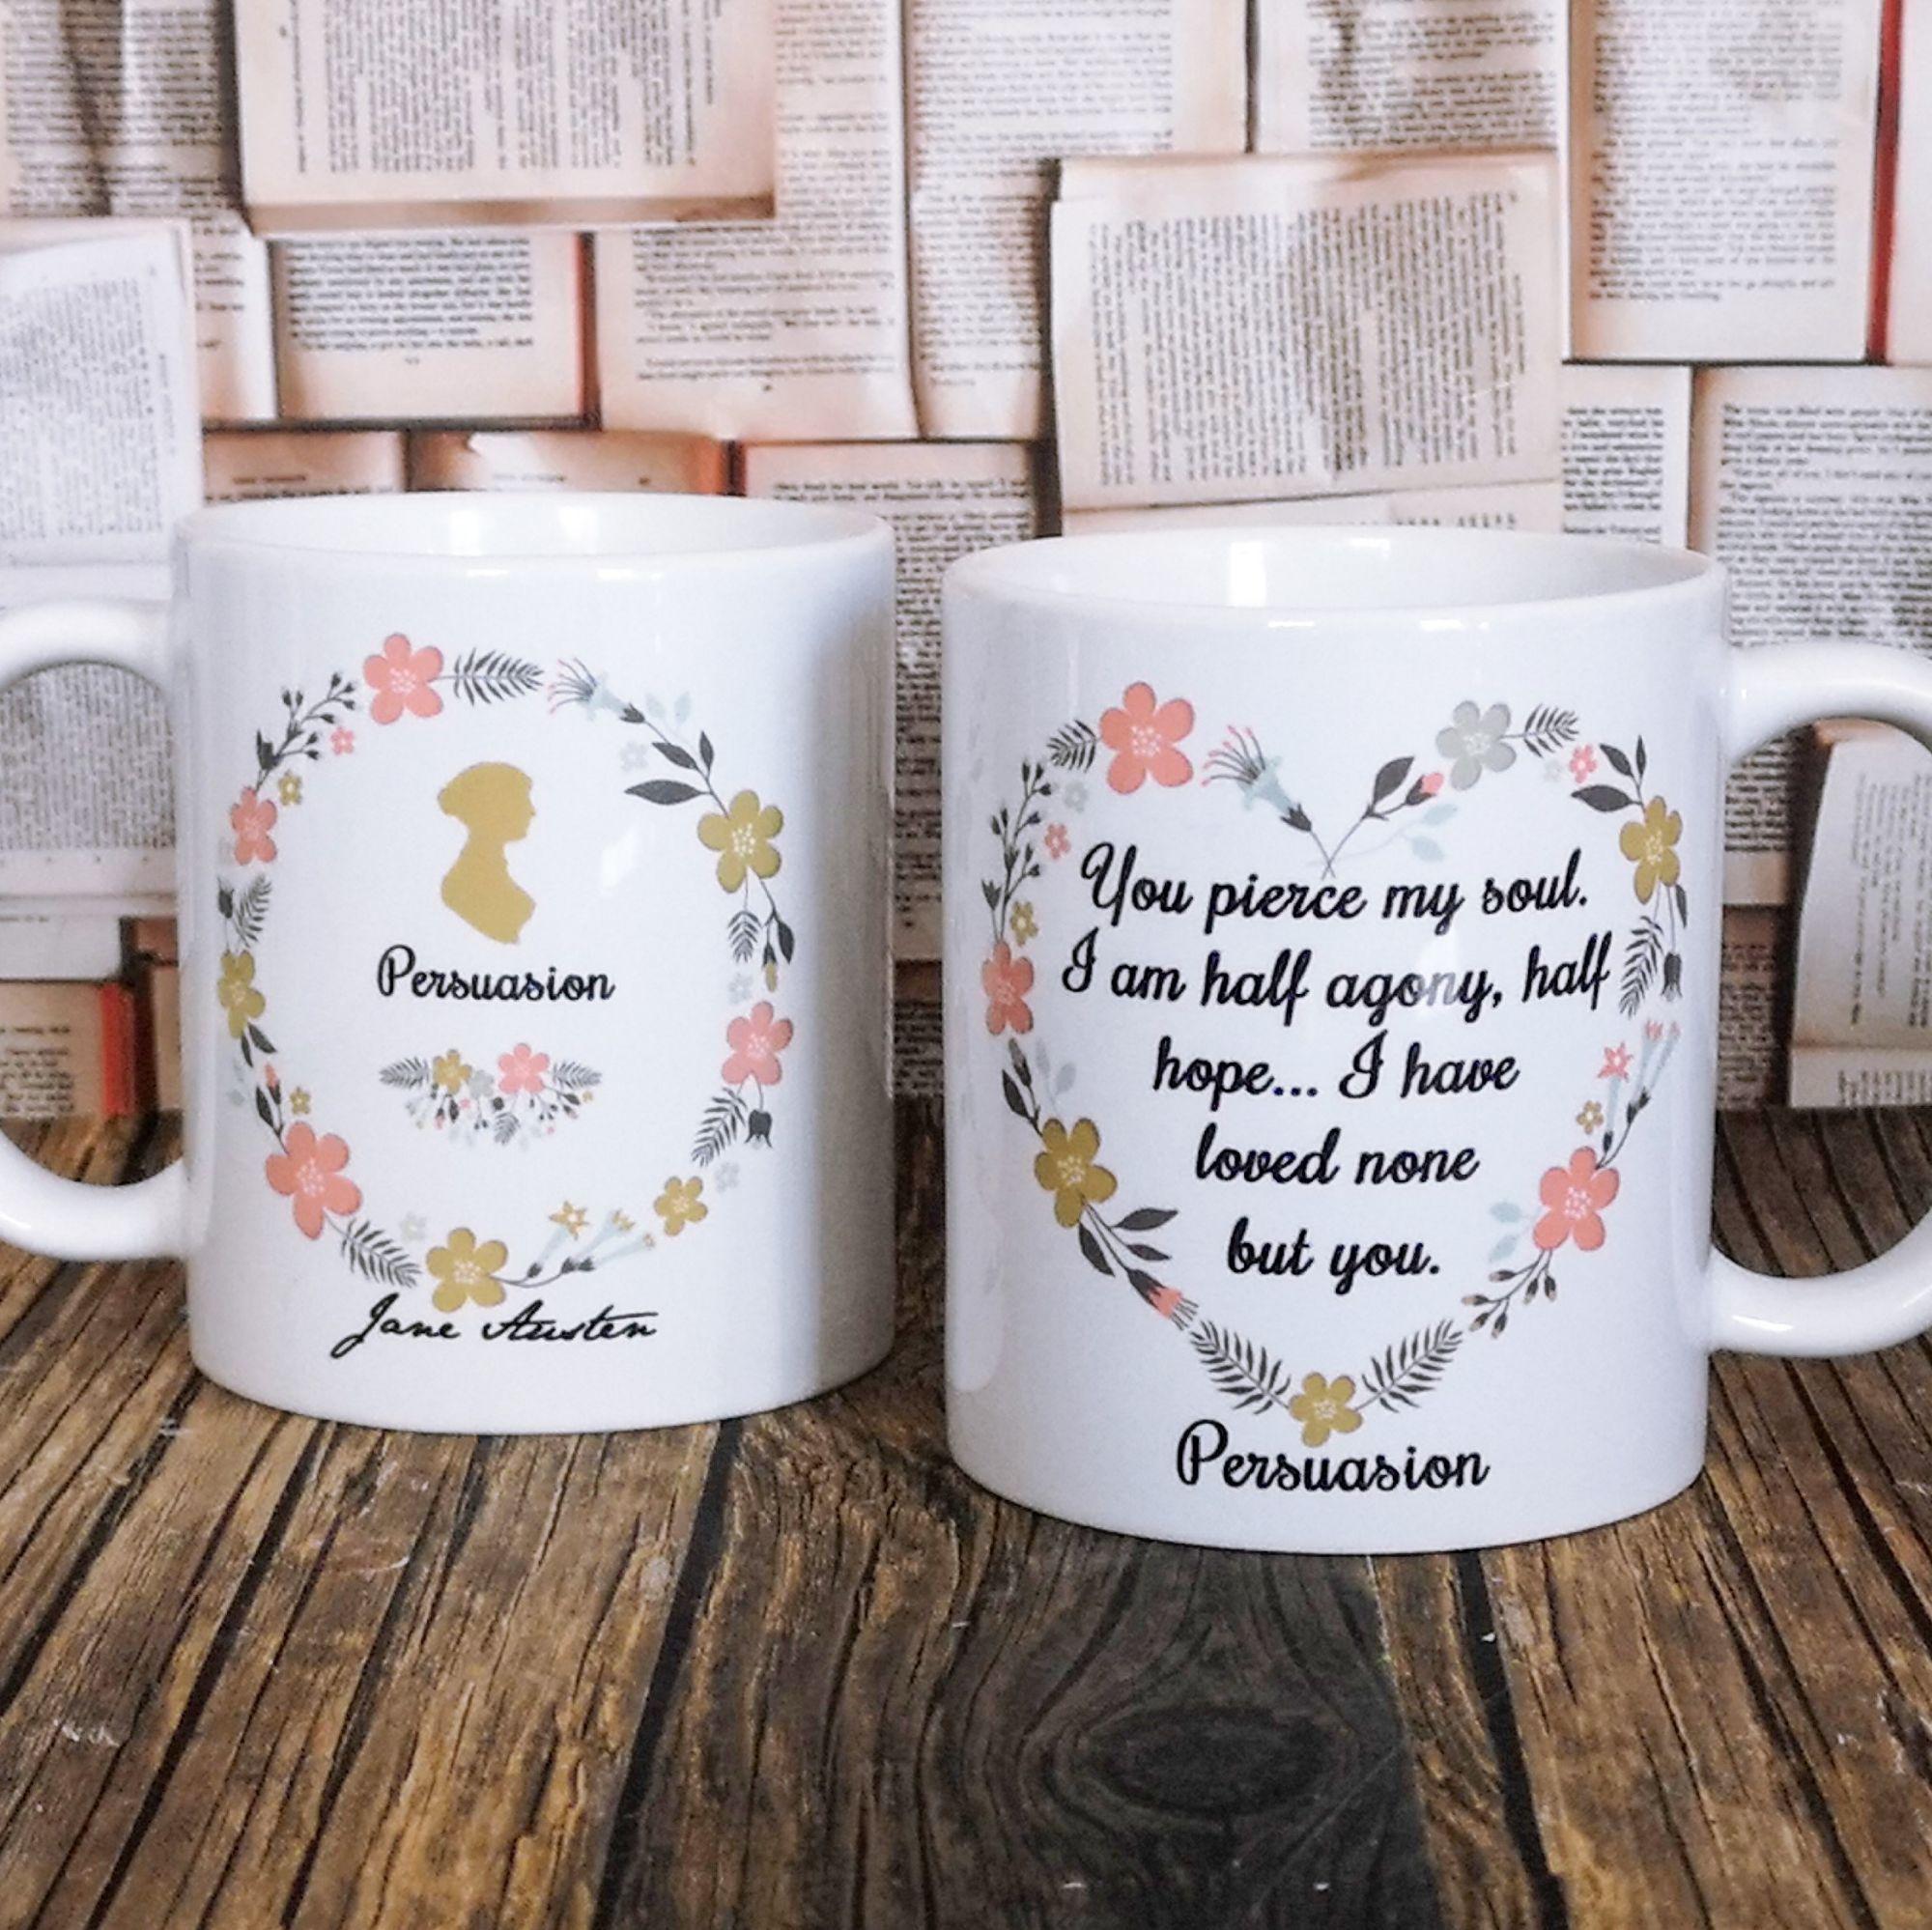 Jane Austen Persuasion Mug Half agony, half hope